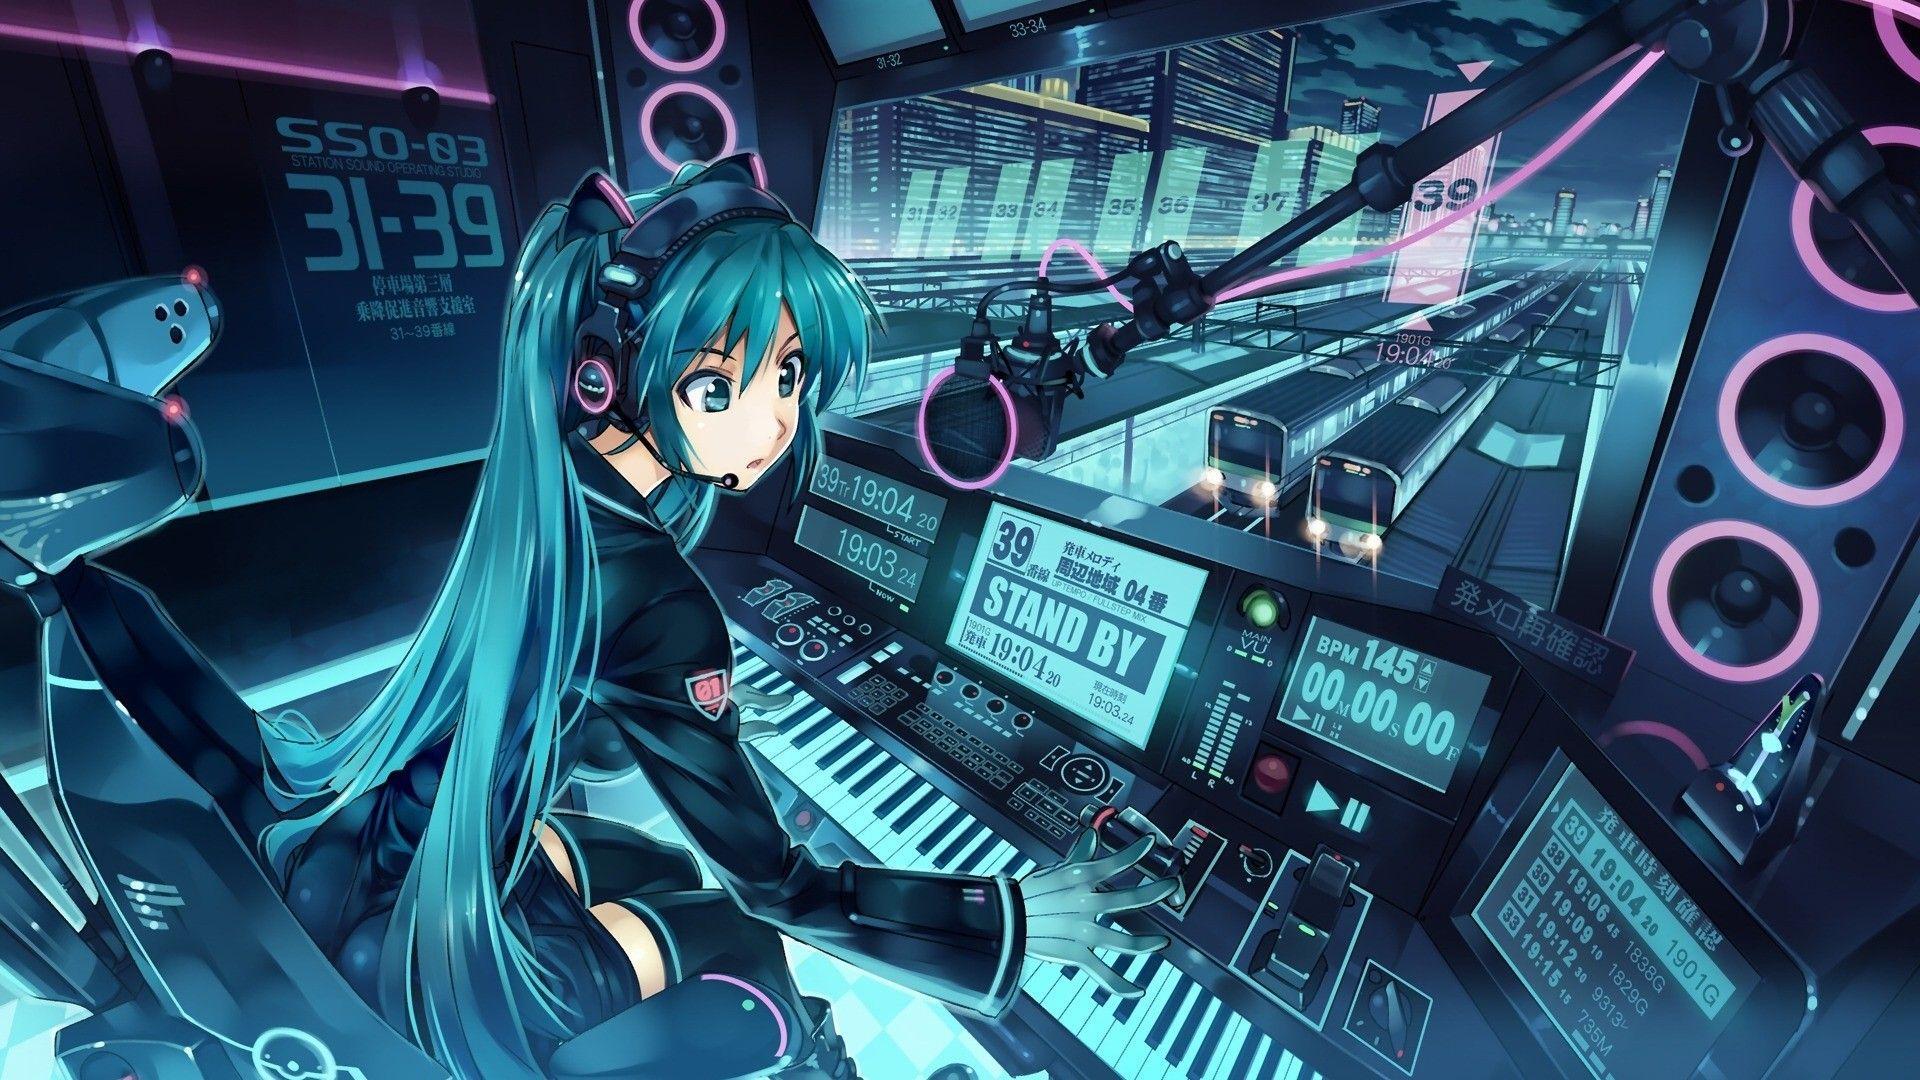 Unduh 85+ Background Keren Anime HD Gratis